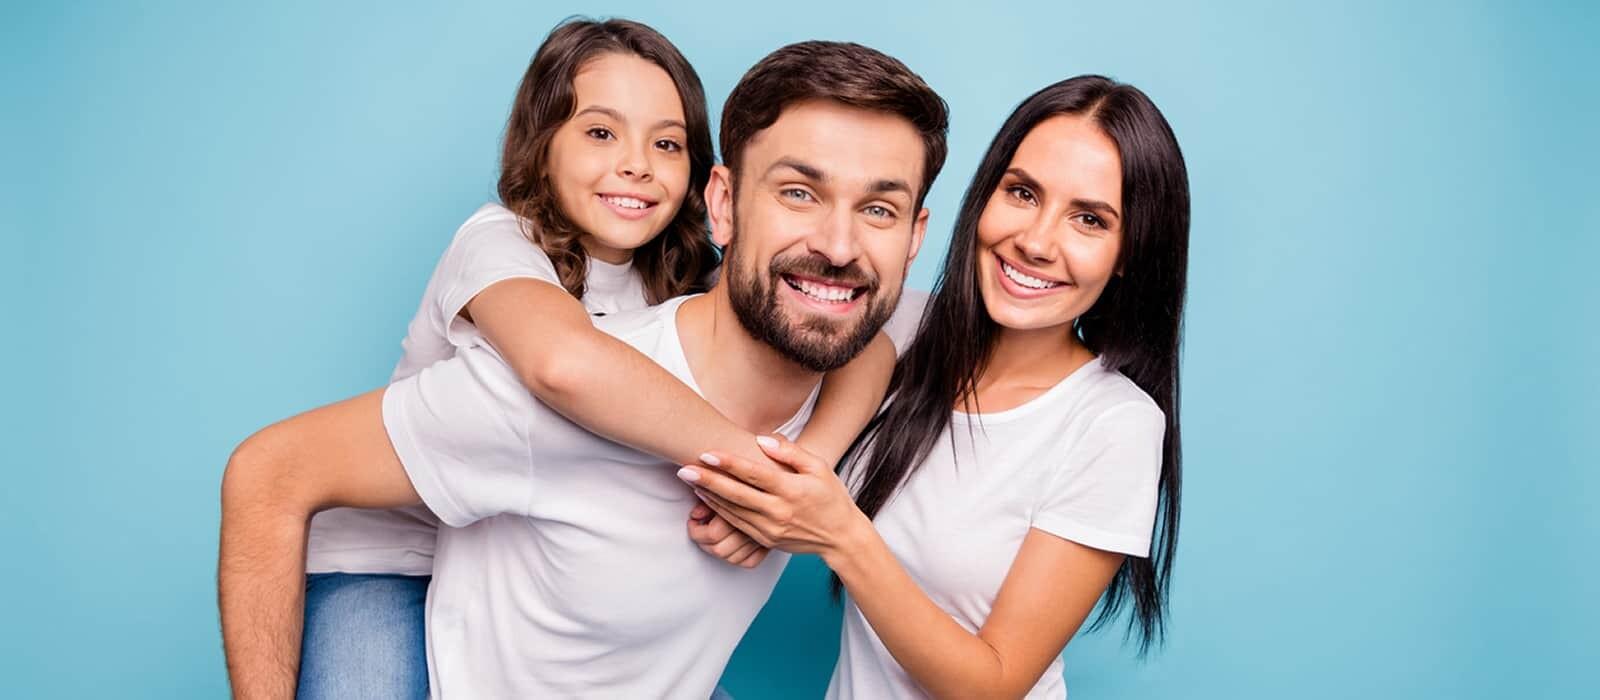 Lakeland FL Family Dentistry